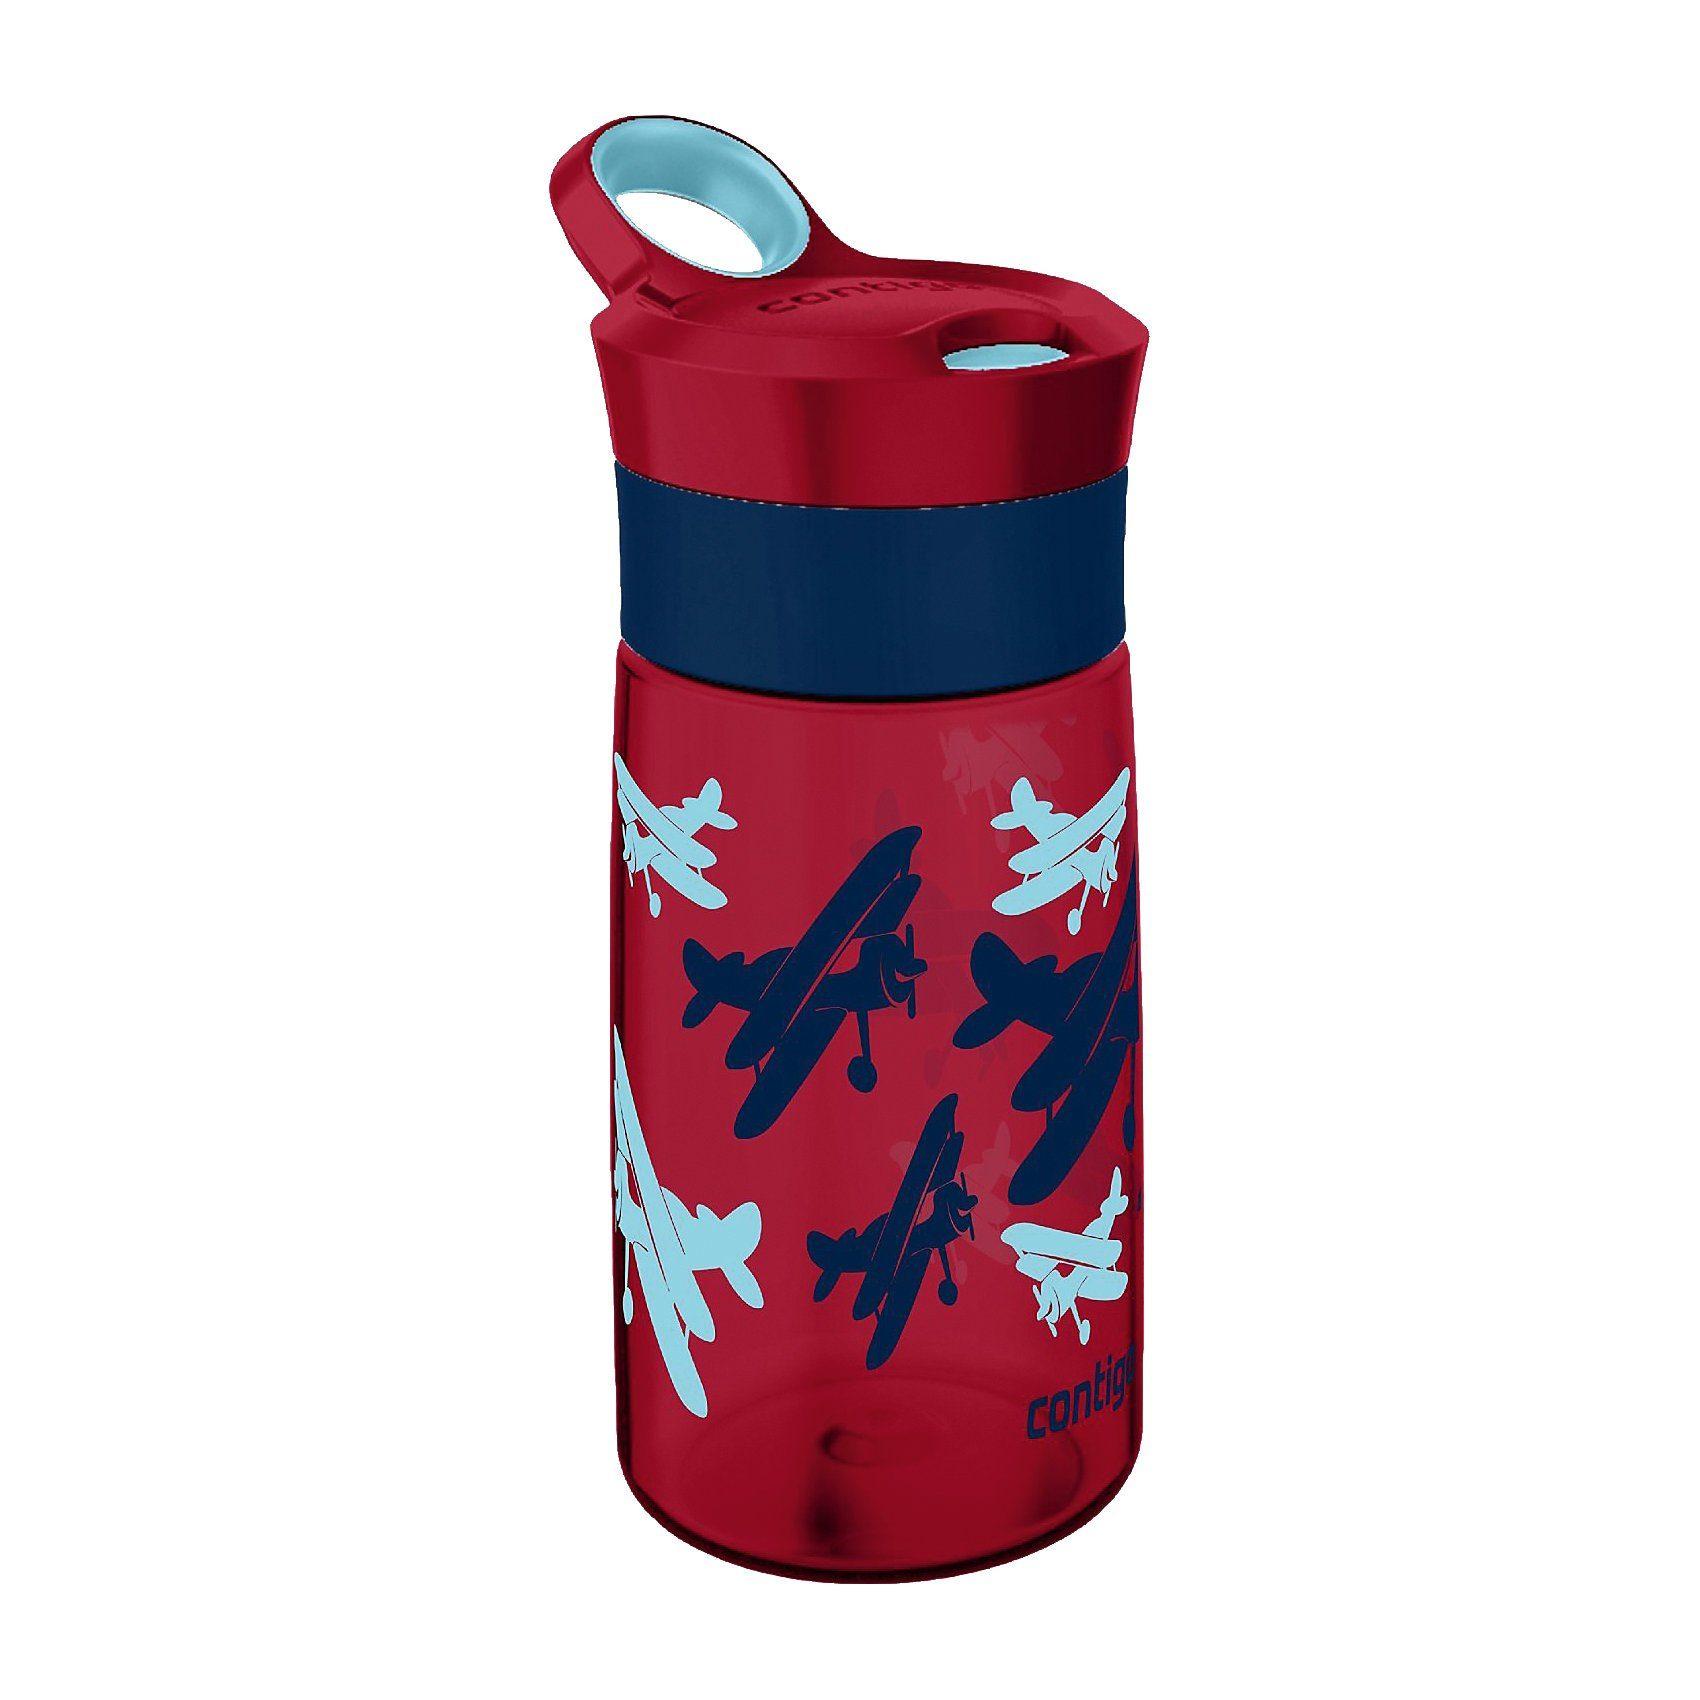 contigo Trinkflasche Gracie red Airplanes, 420 ml